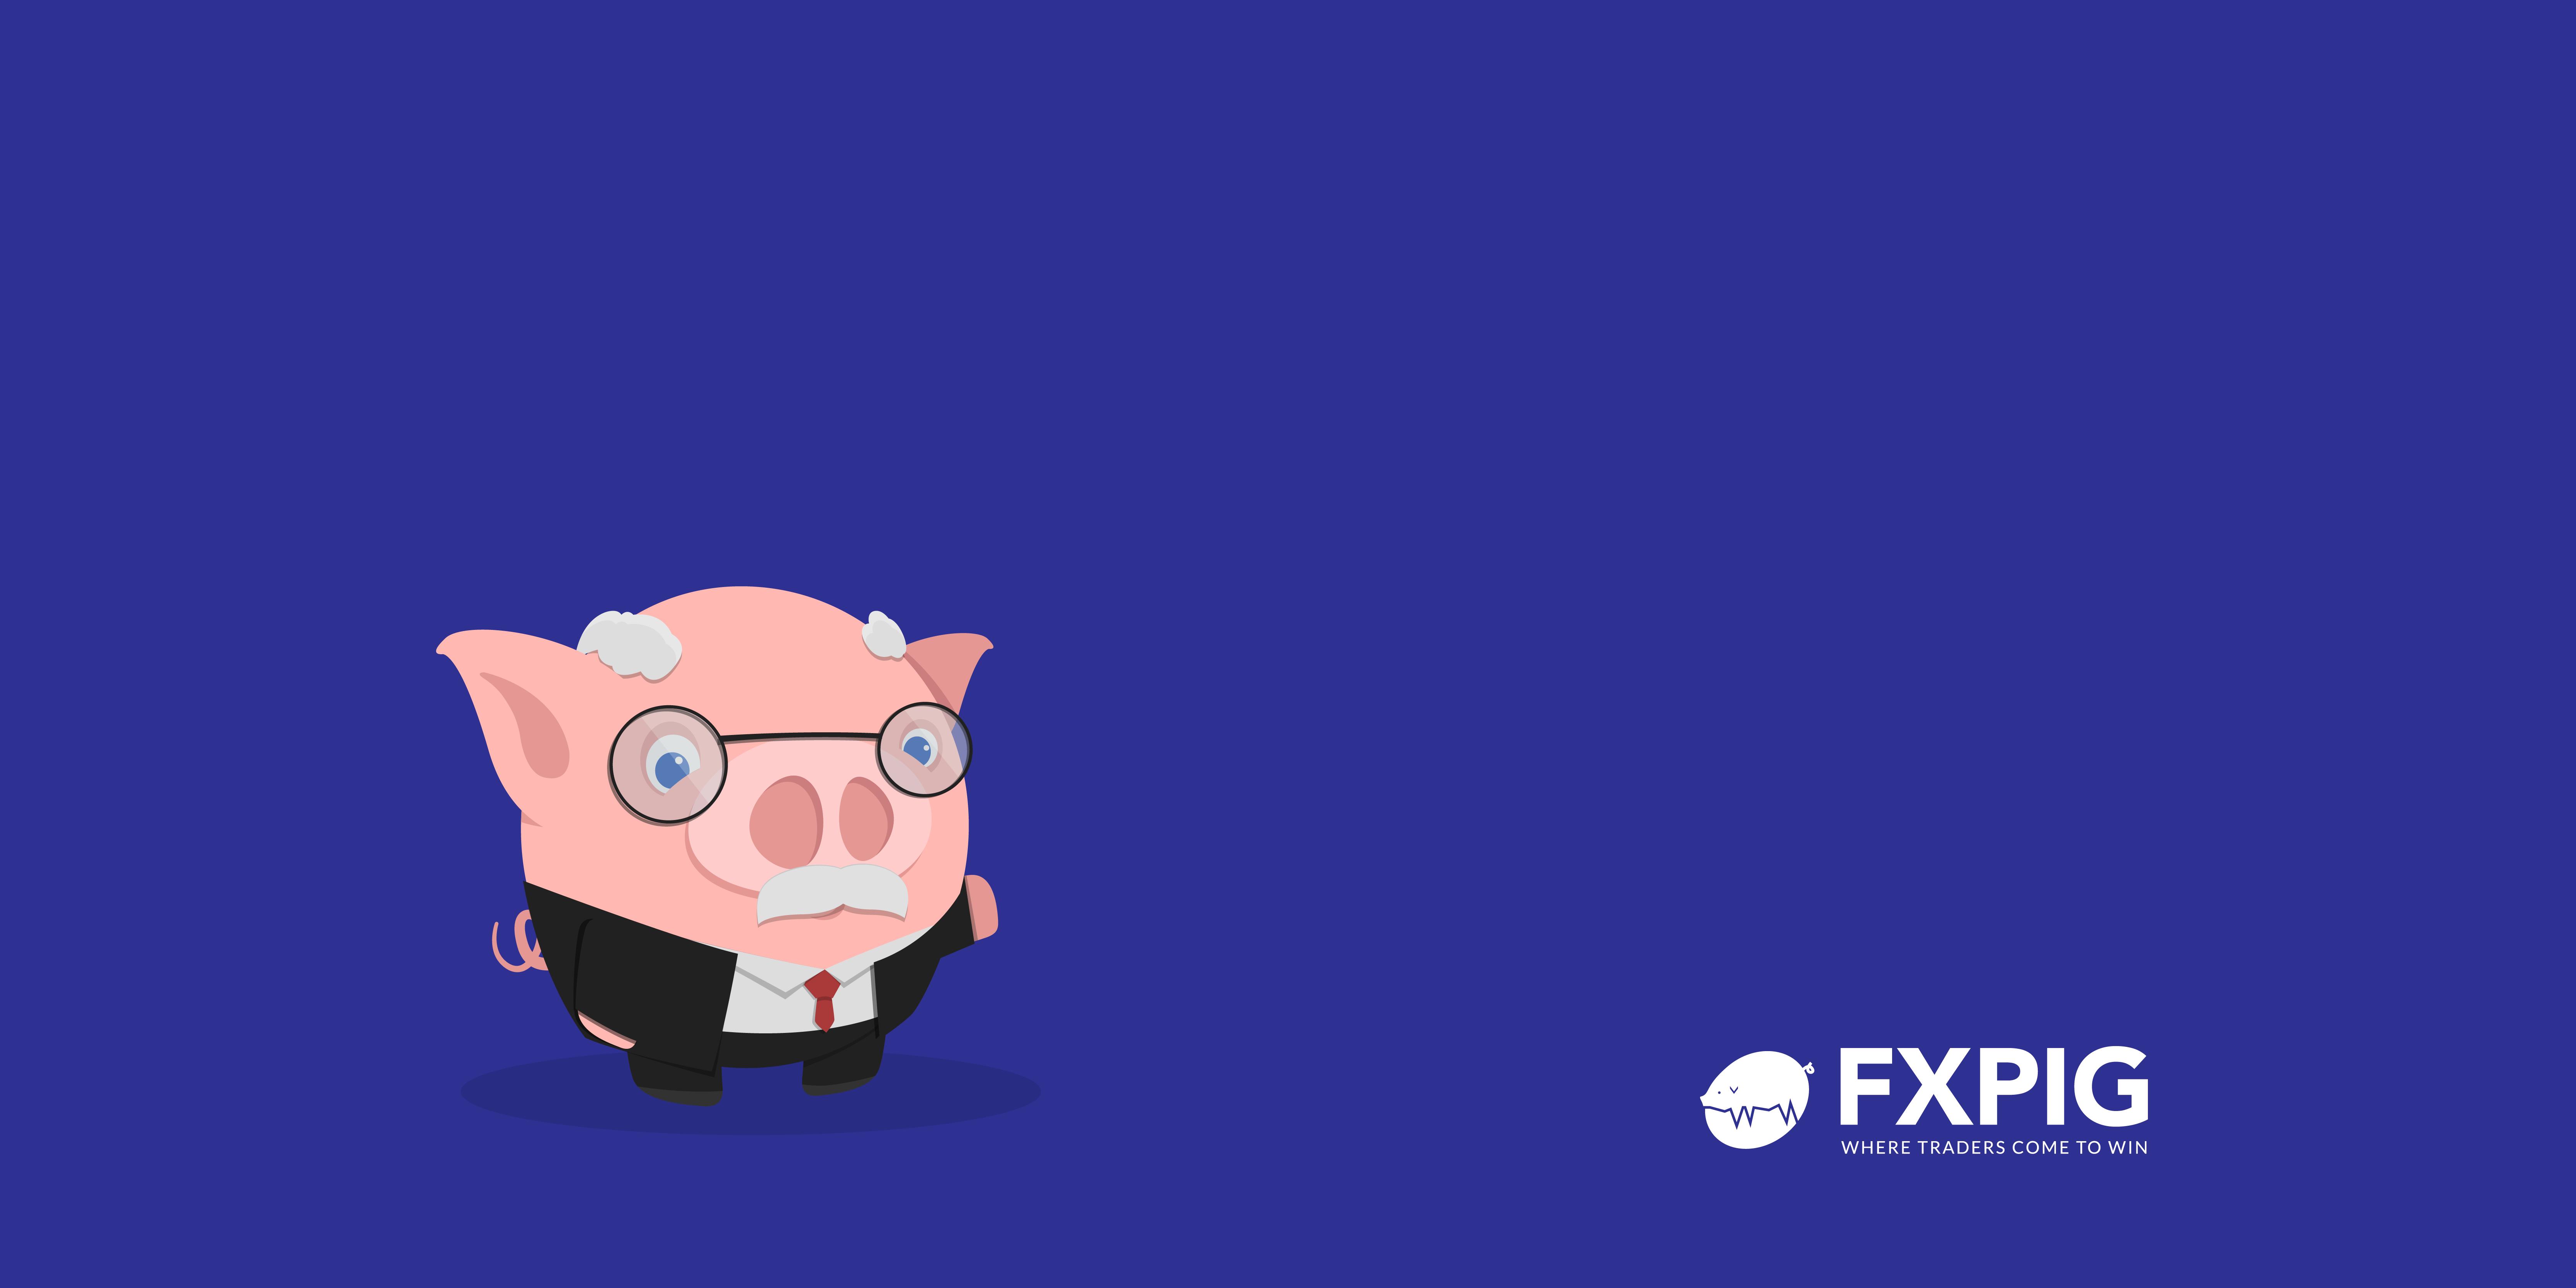 FOREX_Trading-wisdom_quote-pig-insider-risk-control_FXPIG